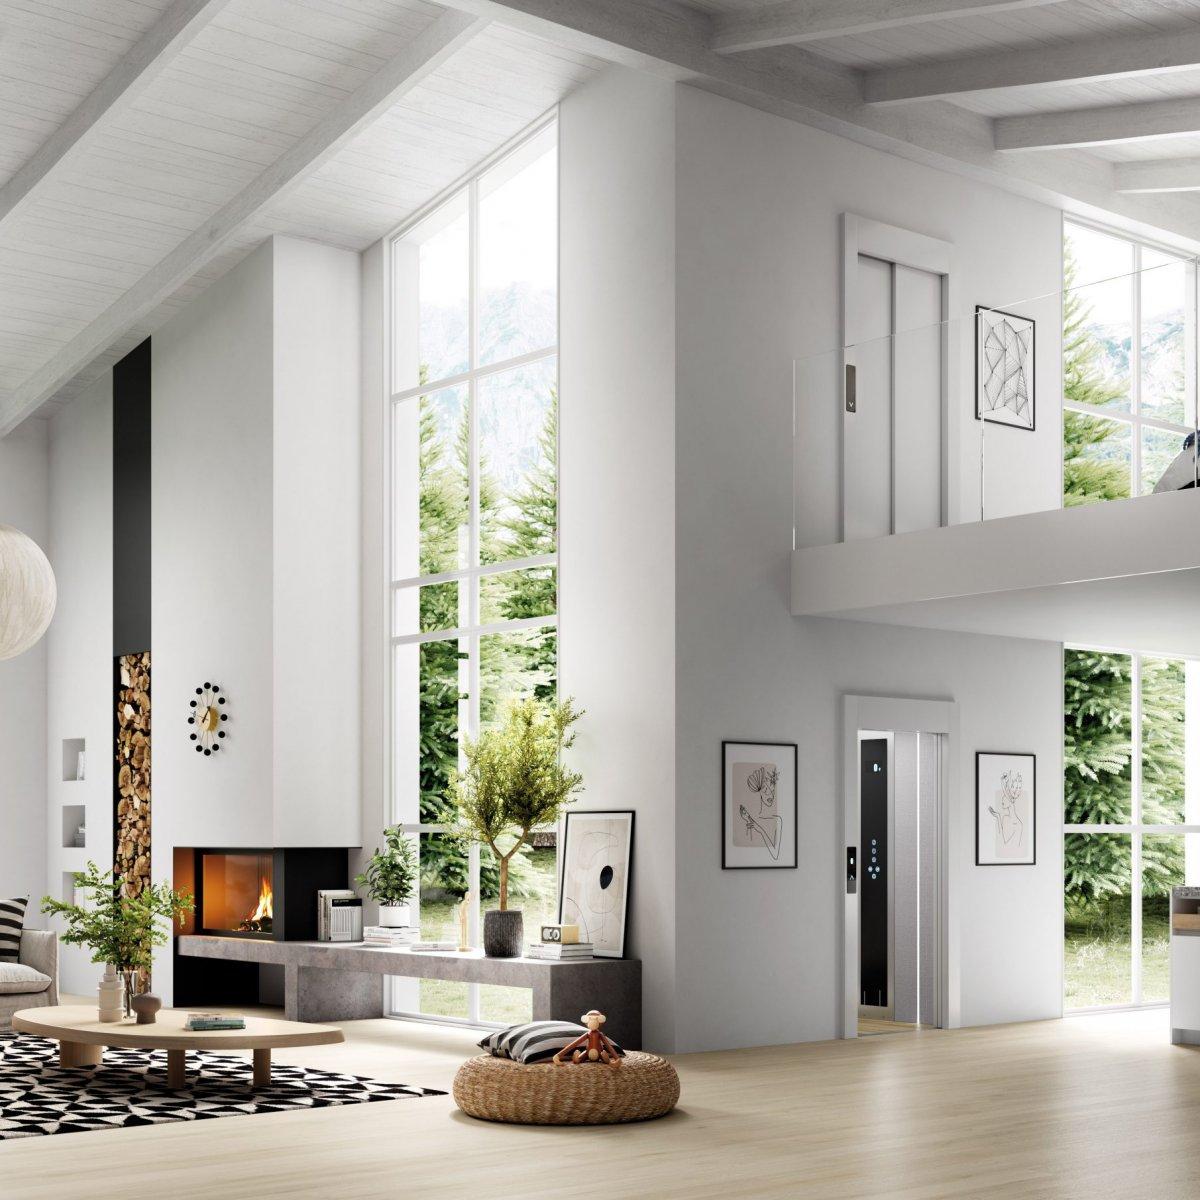 Home Lift   Simplex Elevators Gallery Image 2